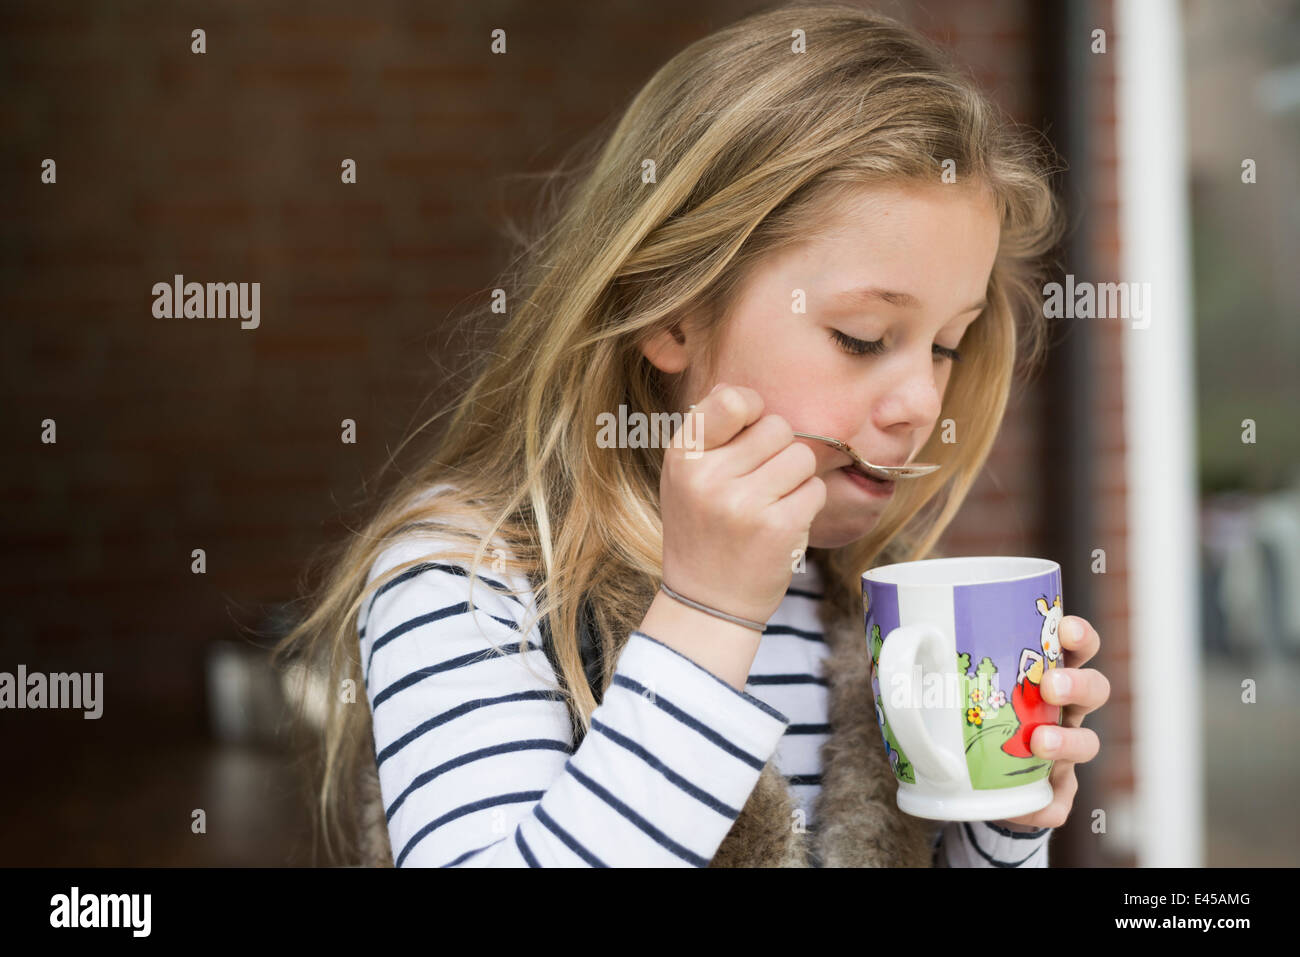 Girl spooning drink from mug - Stock Image